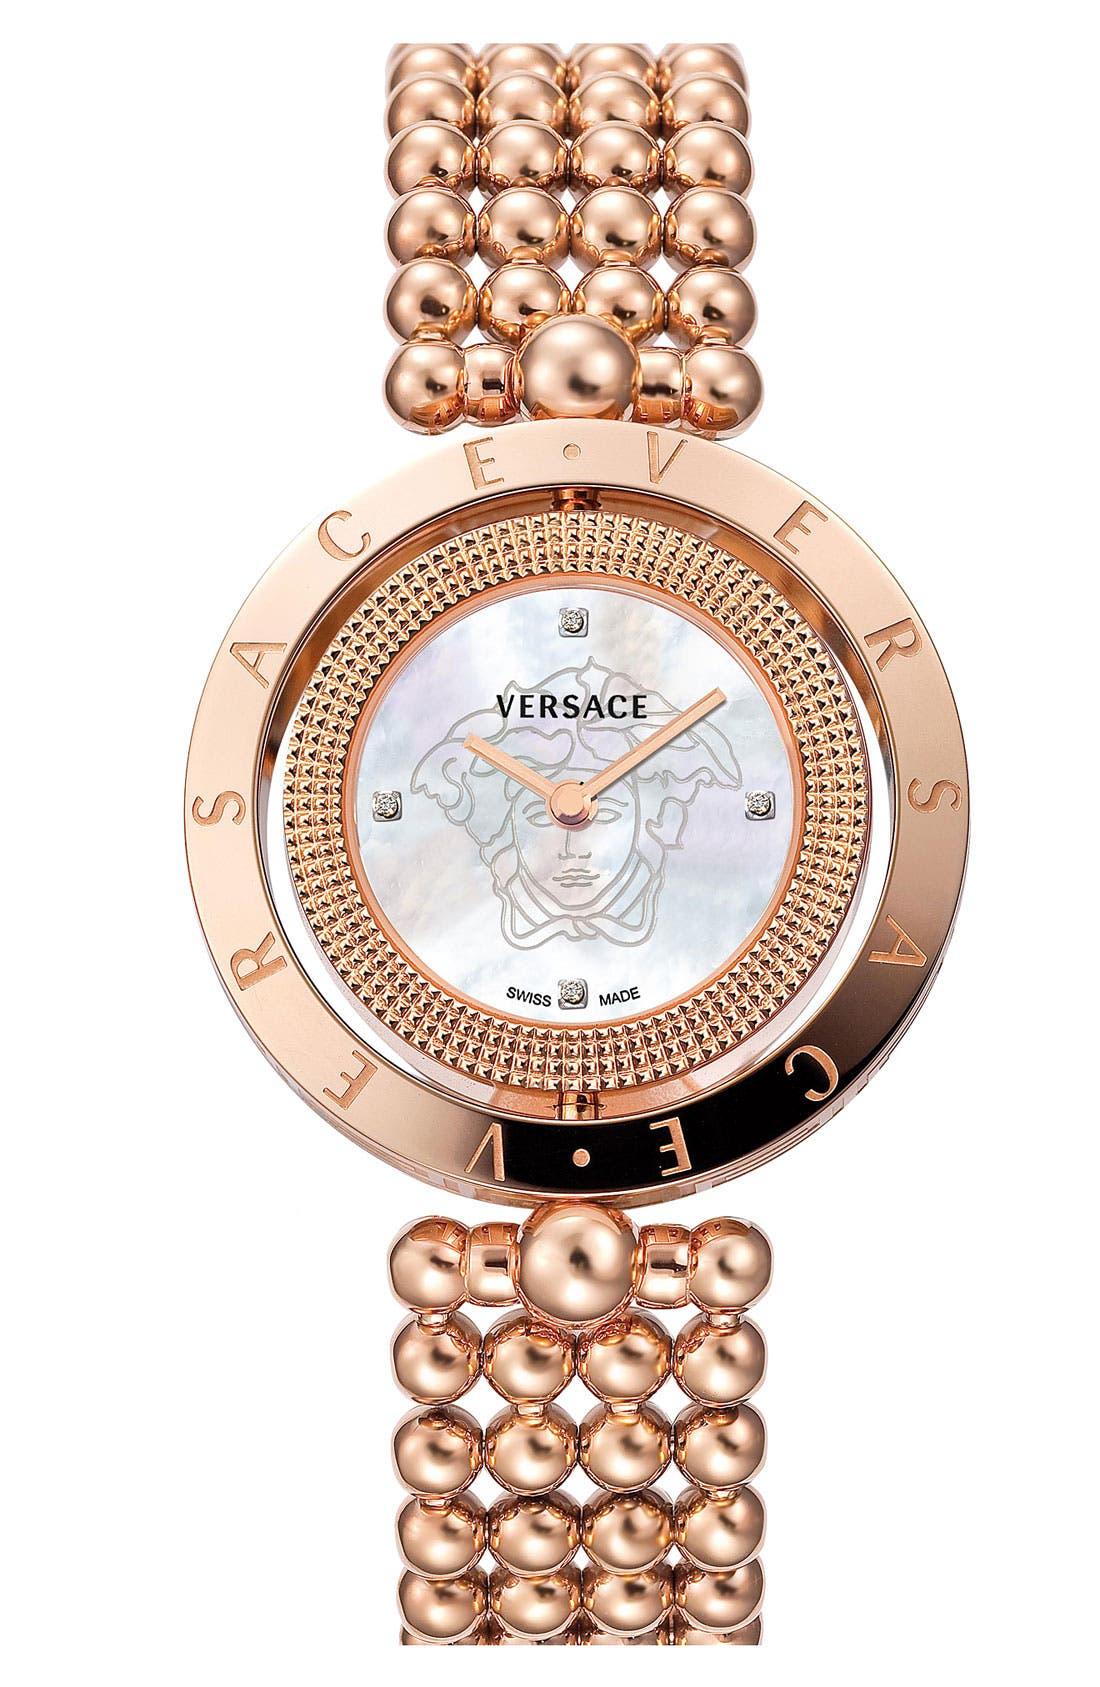 Main Image - Versace 'Eon' Reversible Topring Bracelet Watch, 33mm